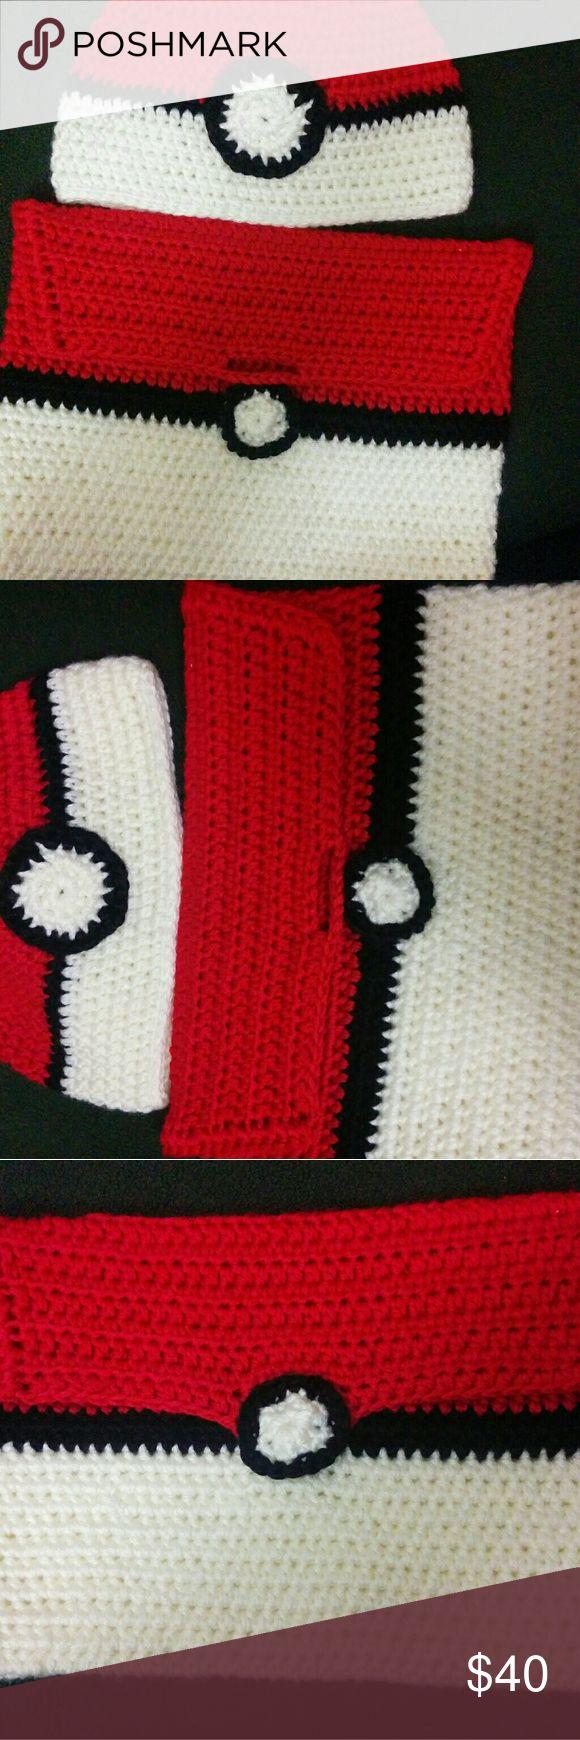 Pokemon hat with tablet cover Handmade crochet Pokemon hat with tablet cover. Ready to ship. Happy Poshing 😎 handmade Other